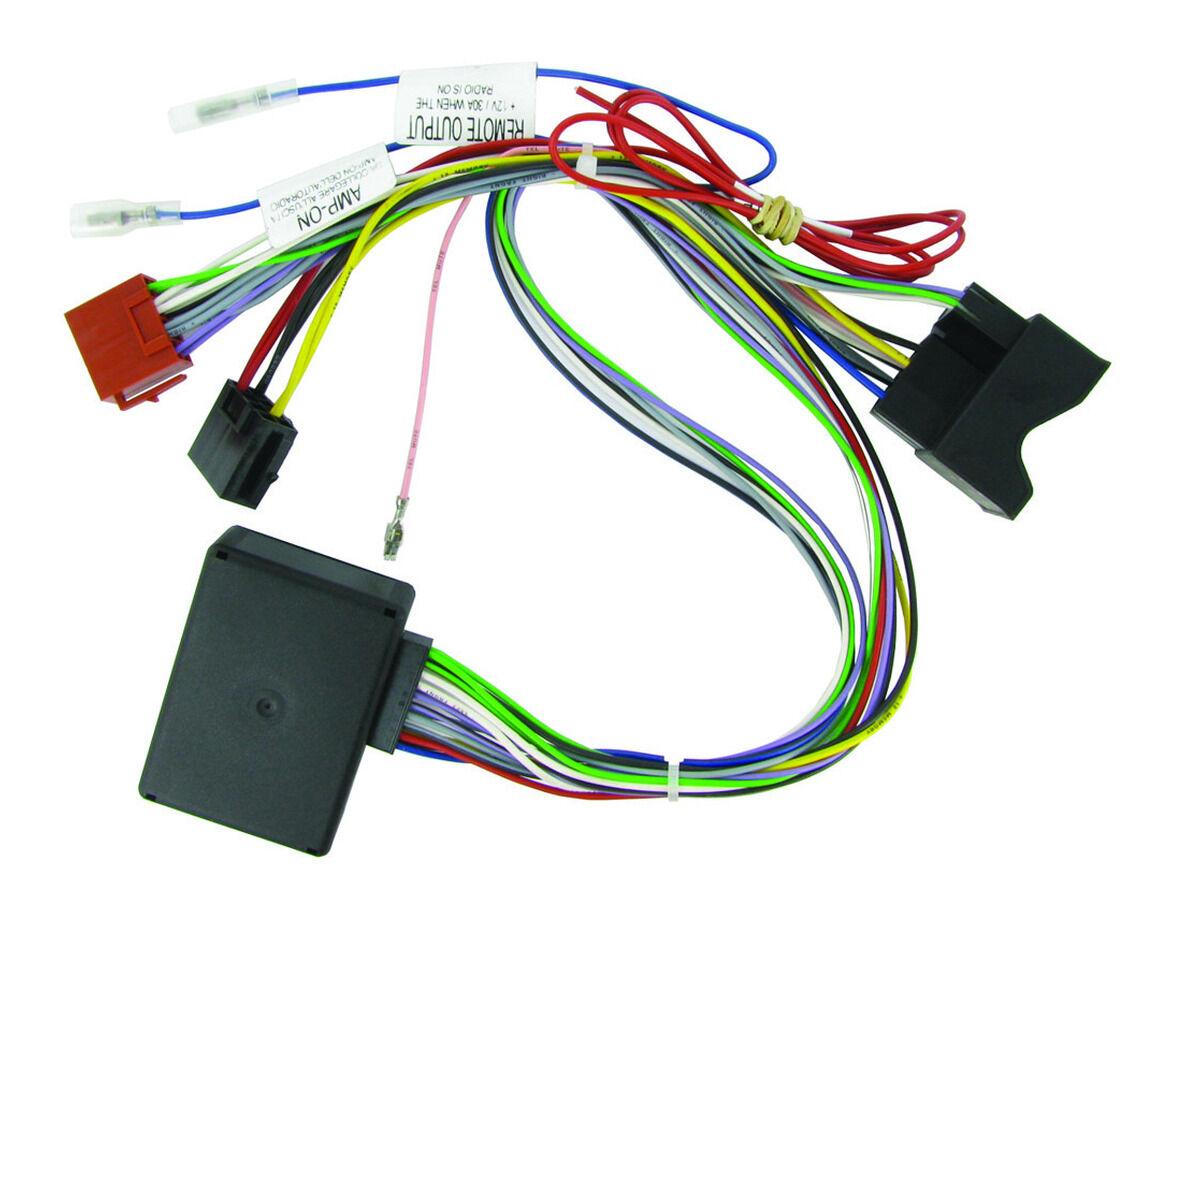 hight resolution of harnesses supercheap auto new zealand jvc wiring harness adapter